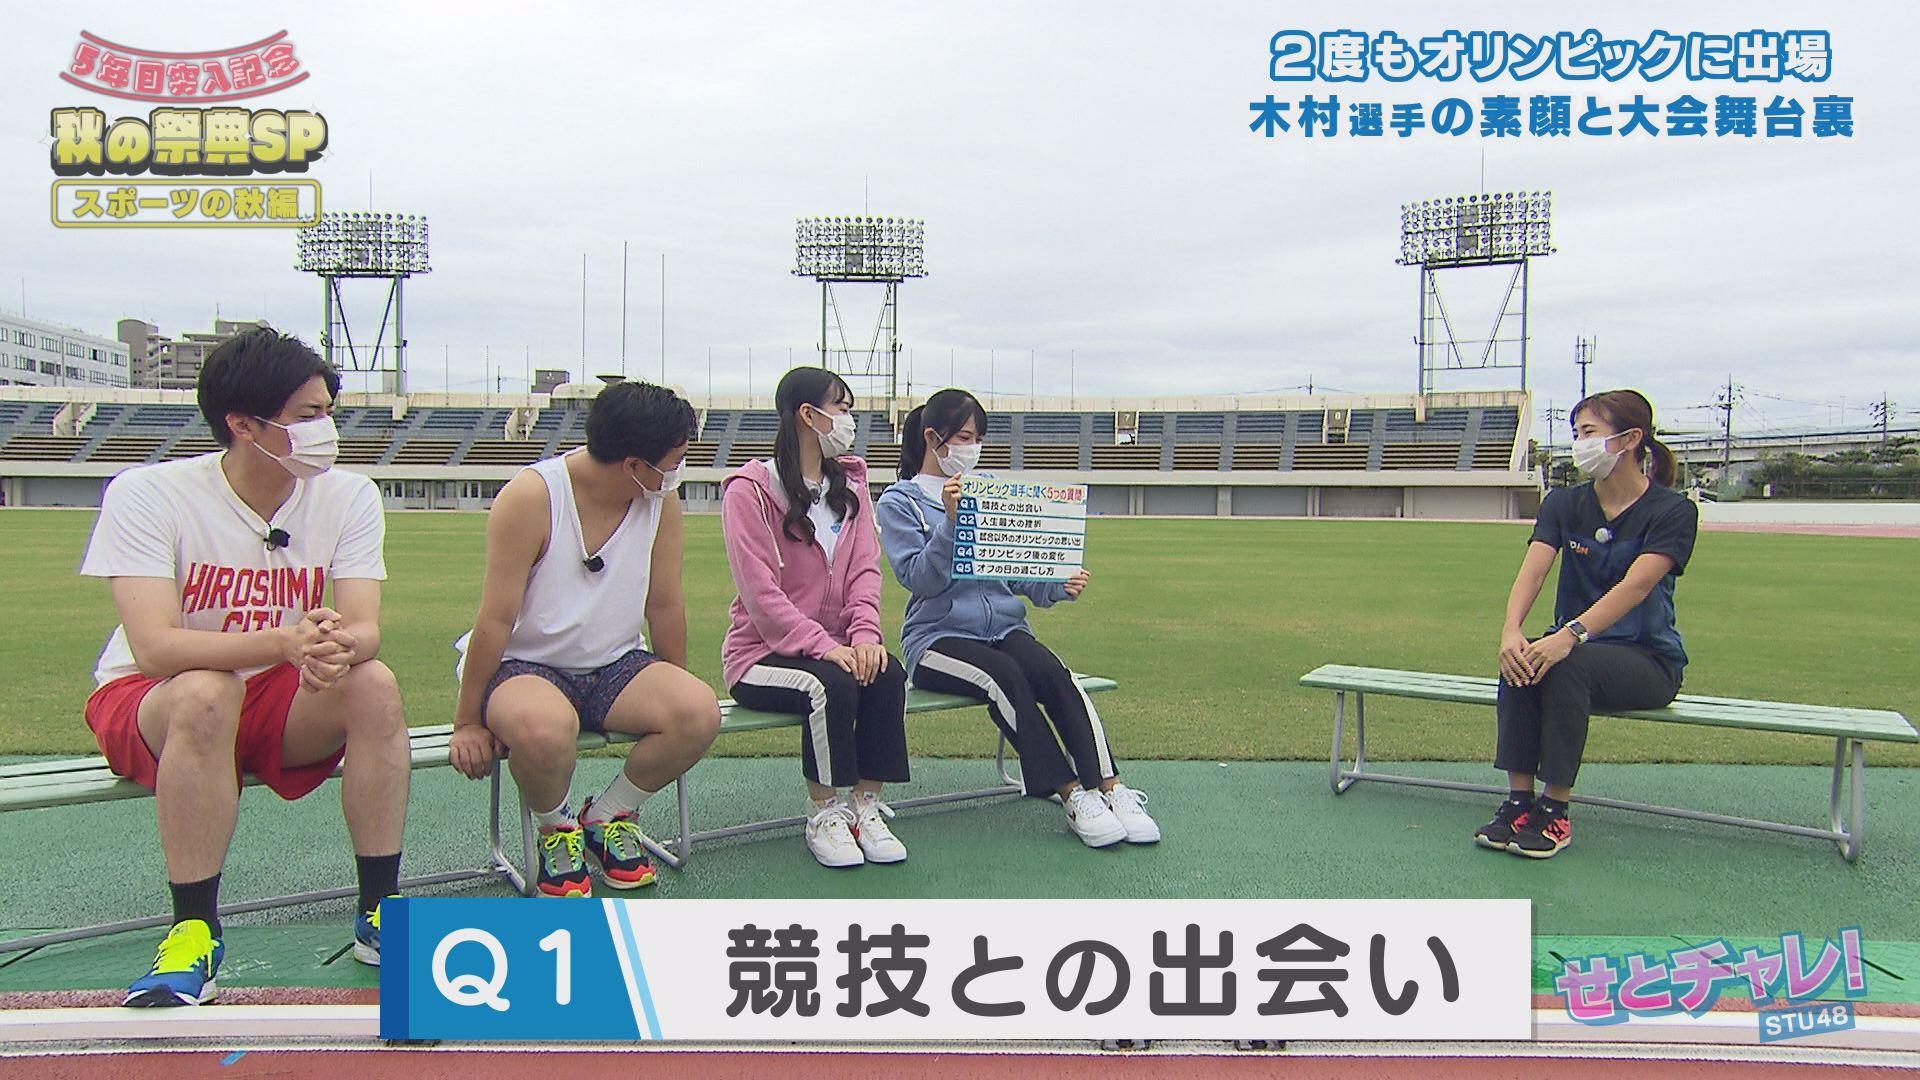 STU48が木村選手にインタビュー